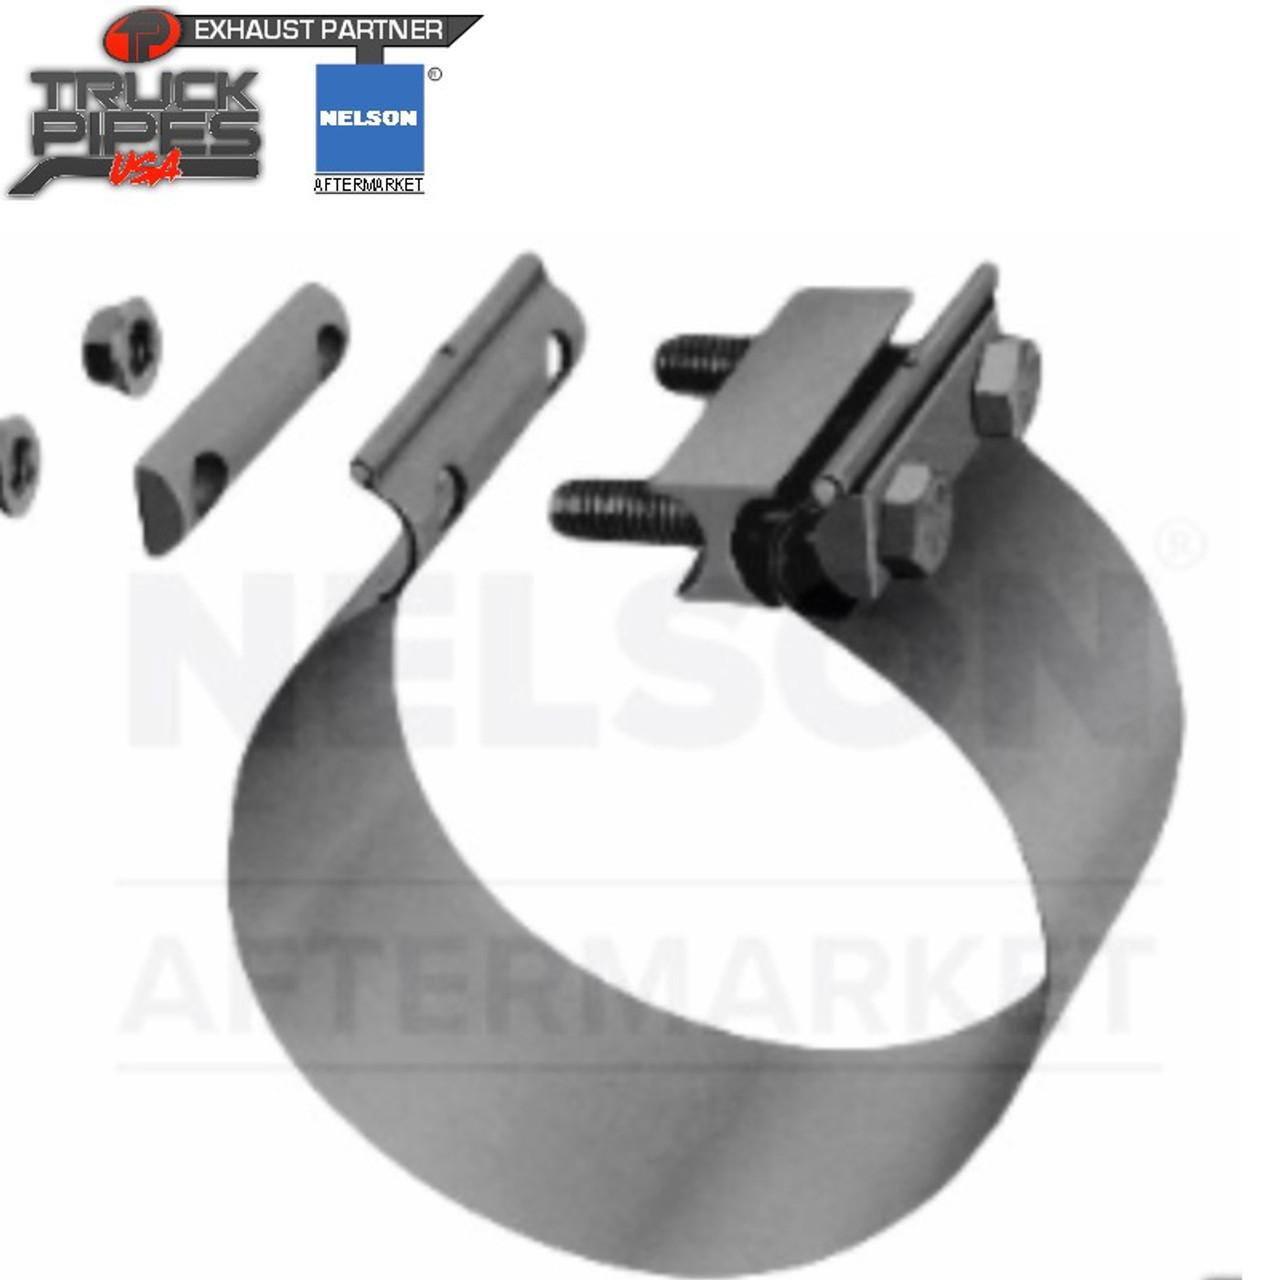 "3.5"" Torctite Butt Joint Exhaust Clamp Aluminized Nelson 90375A"